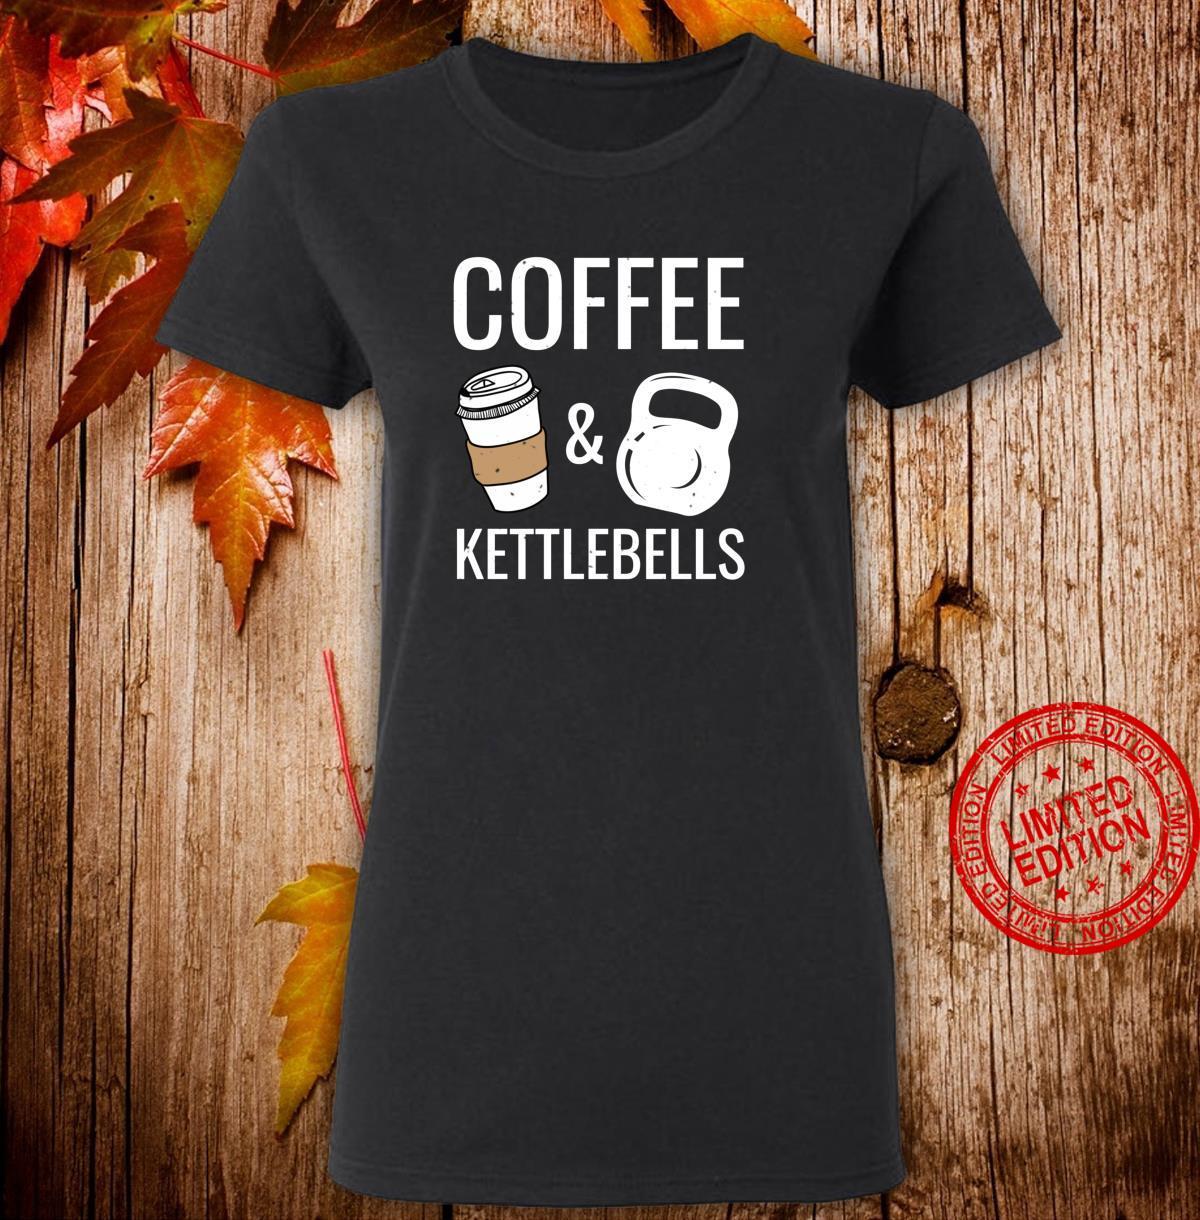 Kettlebells & Coffee HIIT Fitness Workout Gym Shirt ladies tee